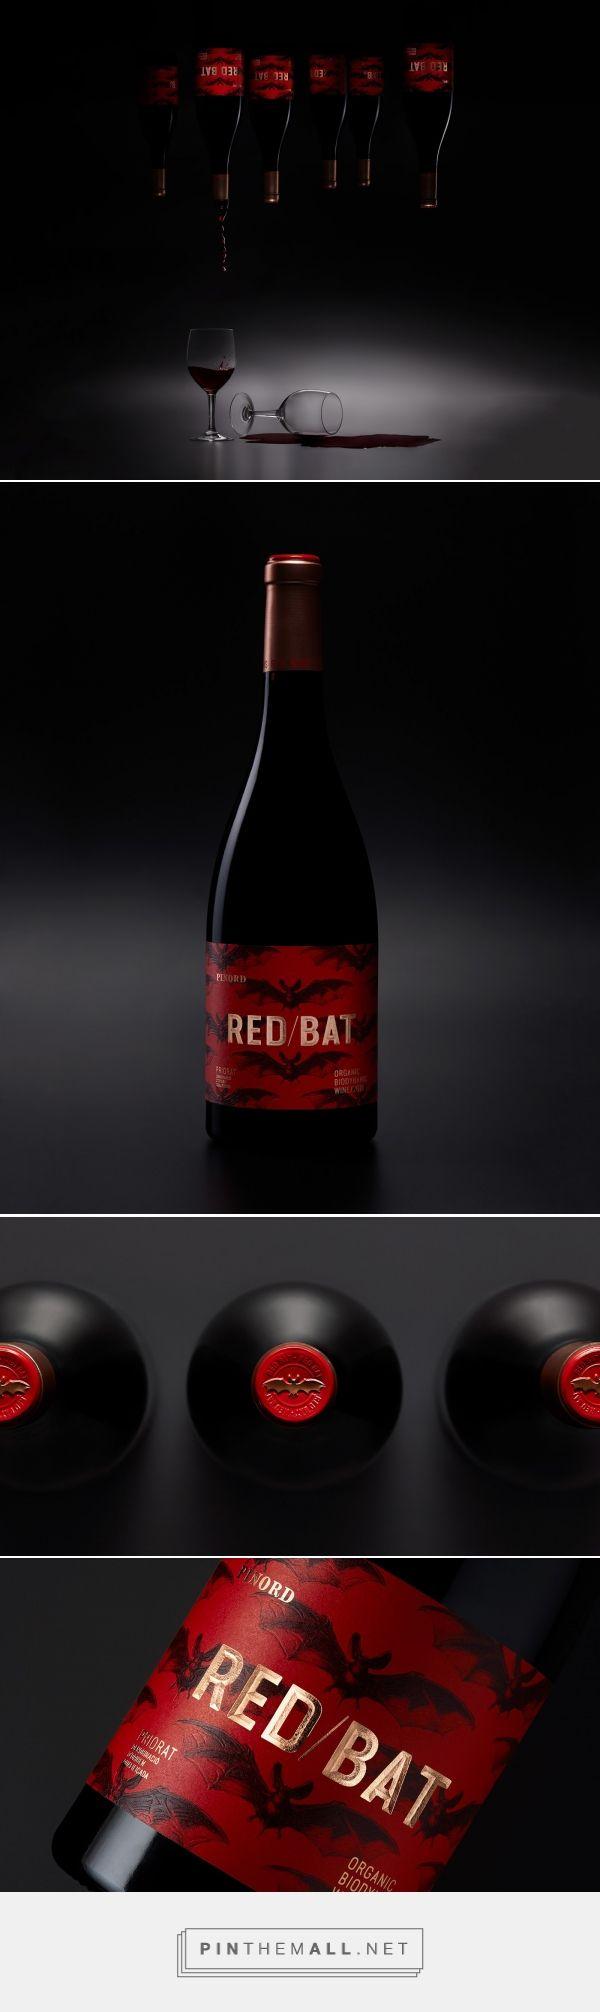 Red Bat wine packaging design by Vibranding - http://www.packagingoftheworld.com/2017/12/red-bat.html